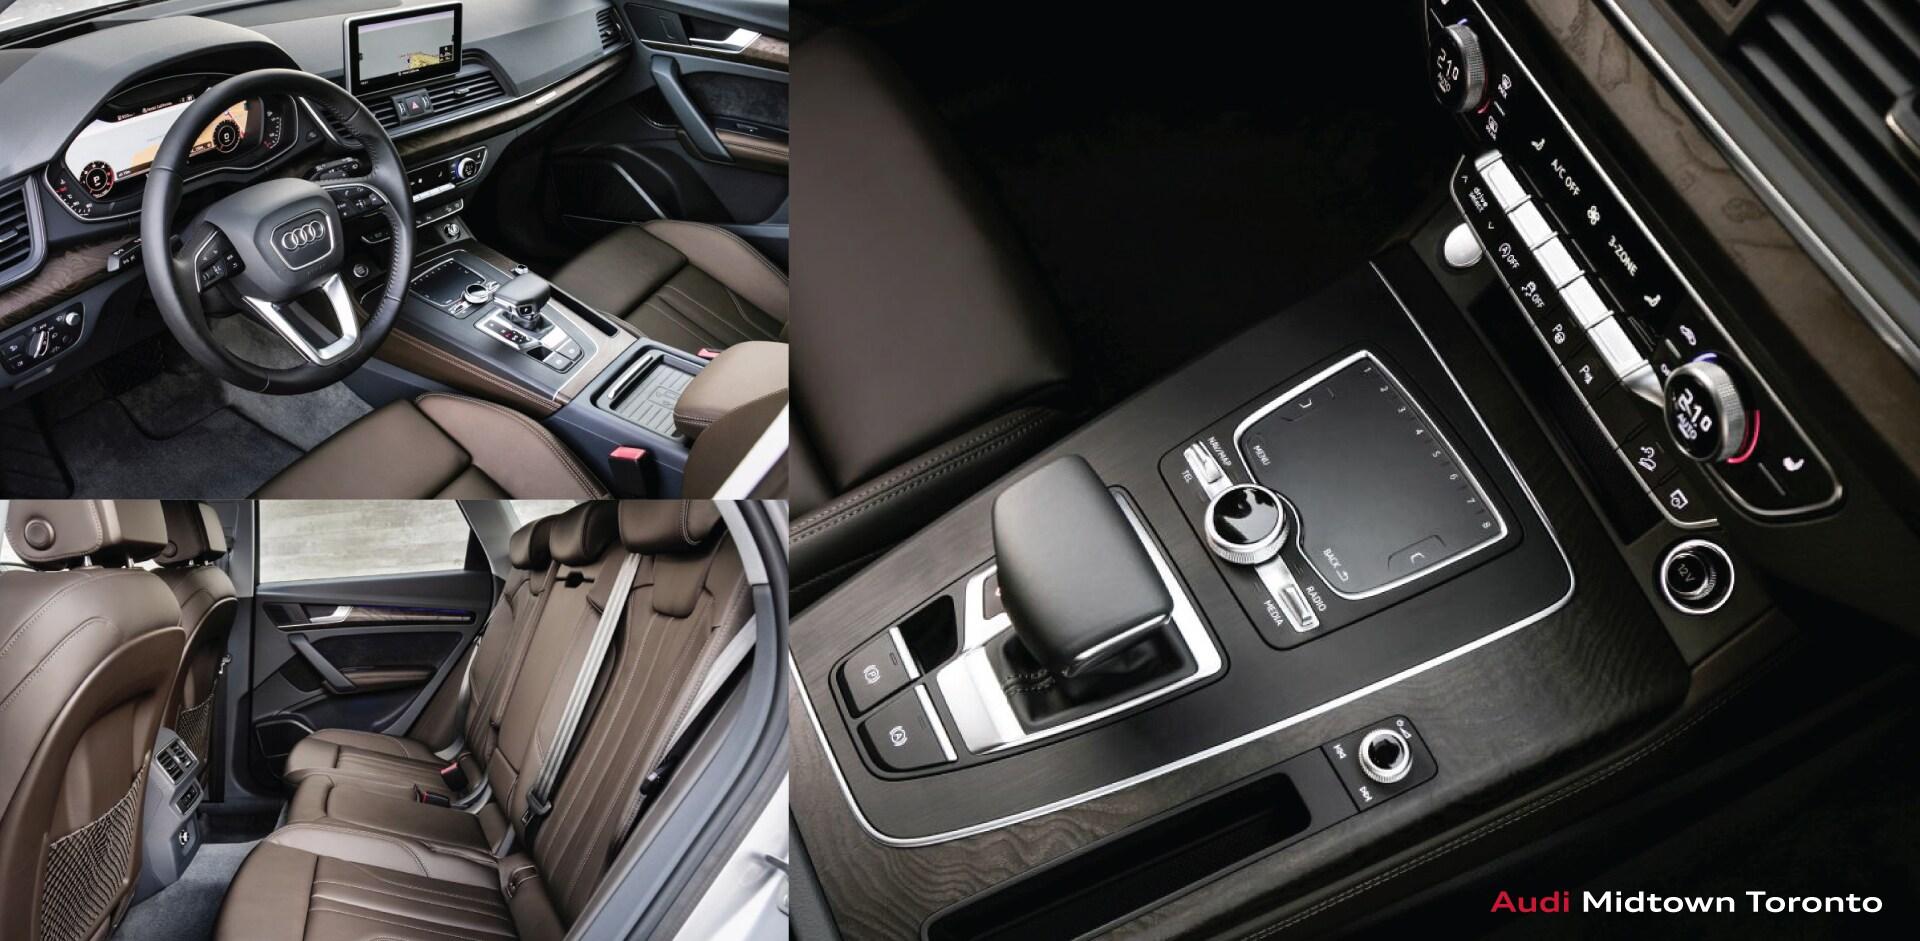 2018 Audi Q5 Toronto for Sale